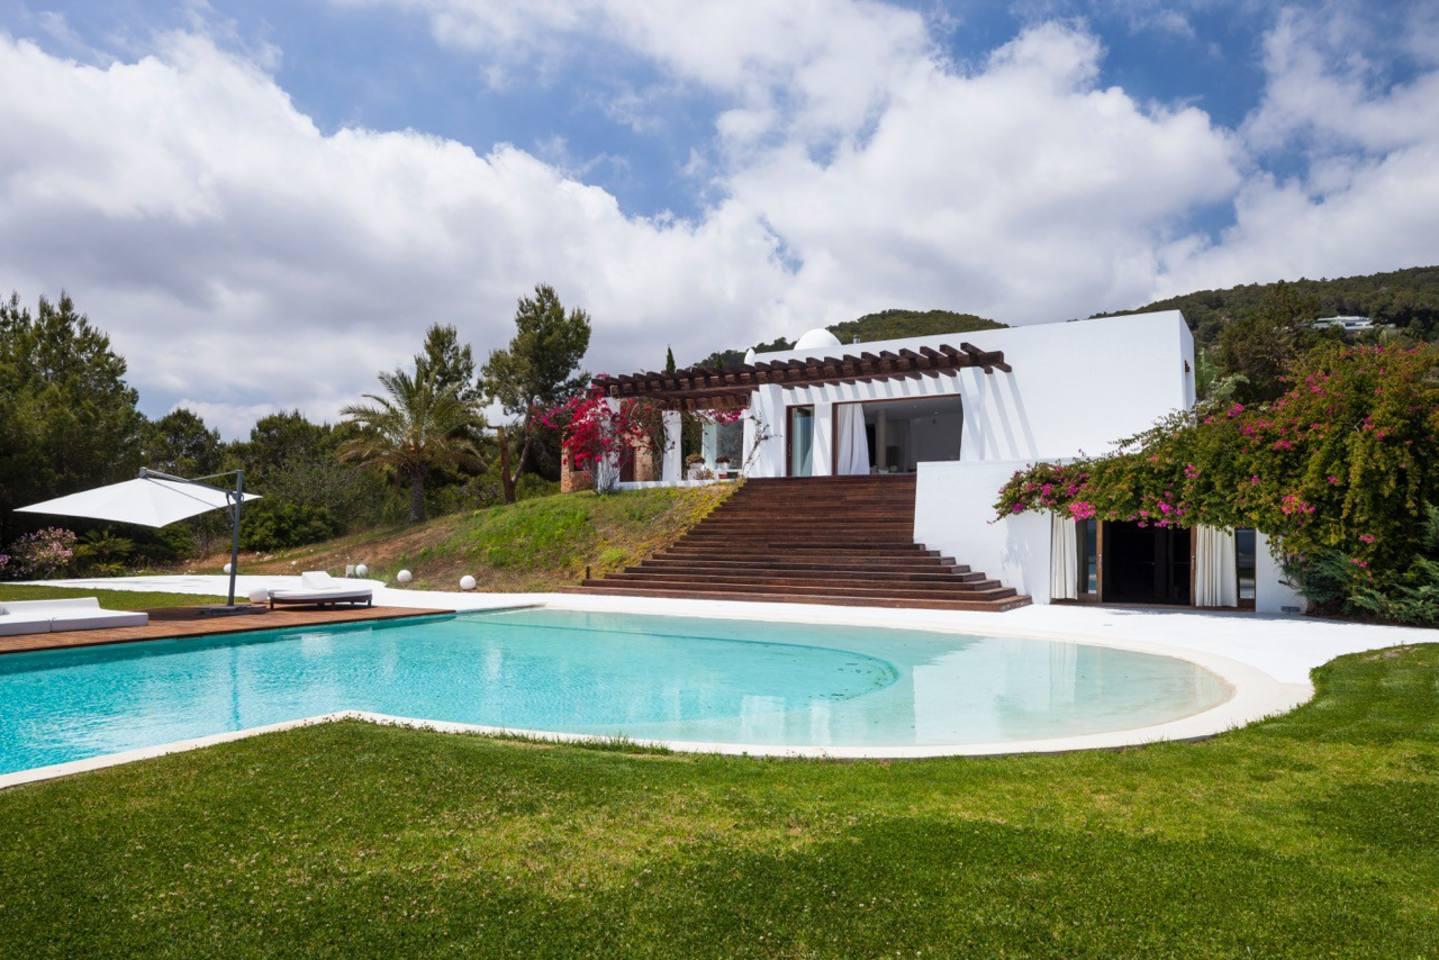 Sensational Villa with a huge infinity pool photo 23926474